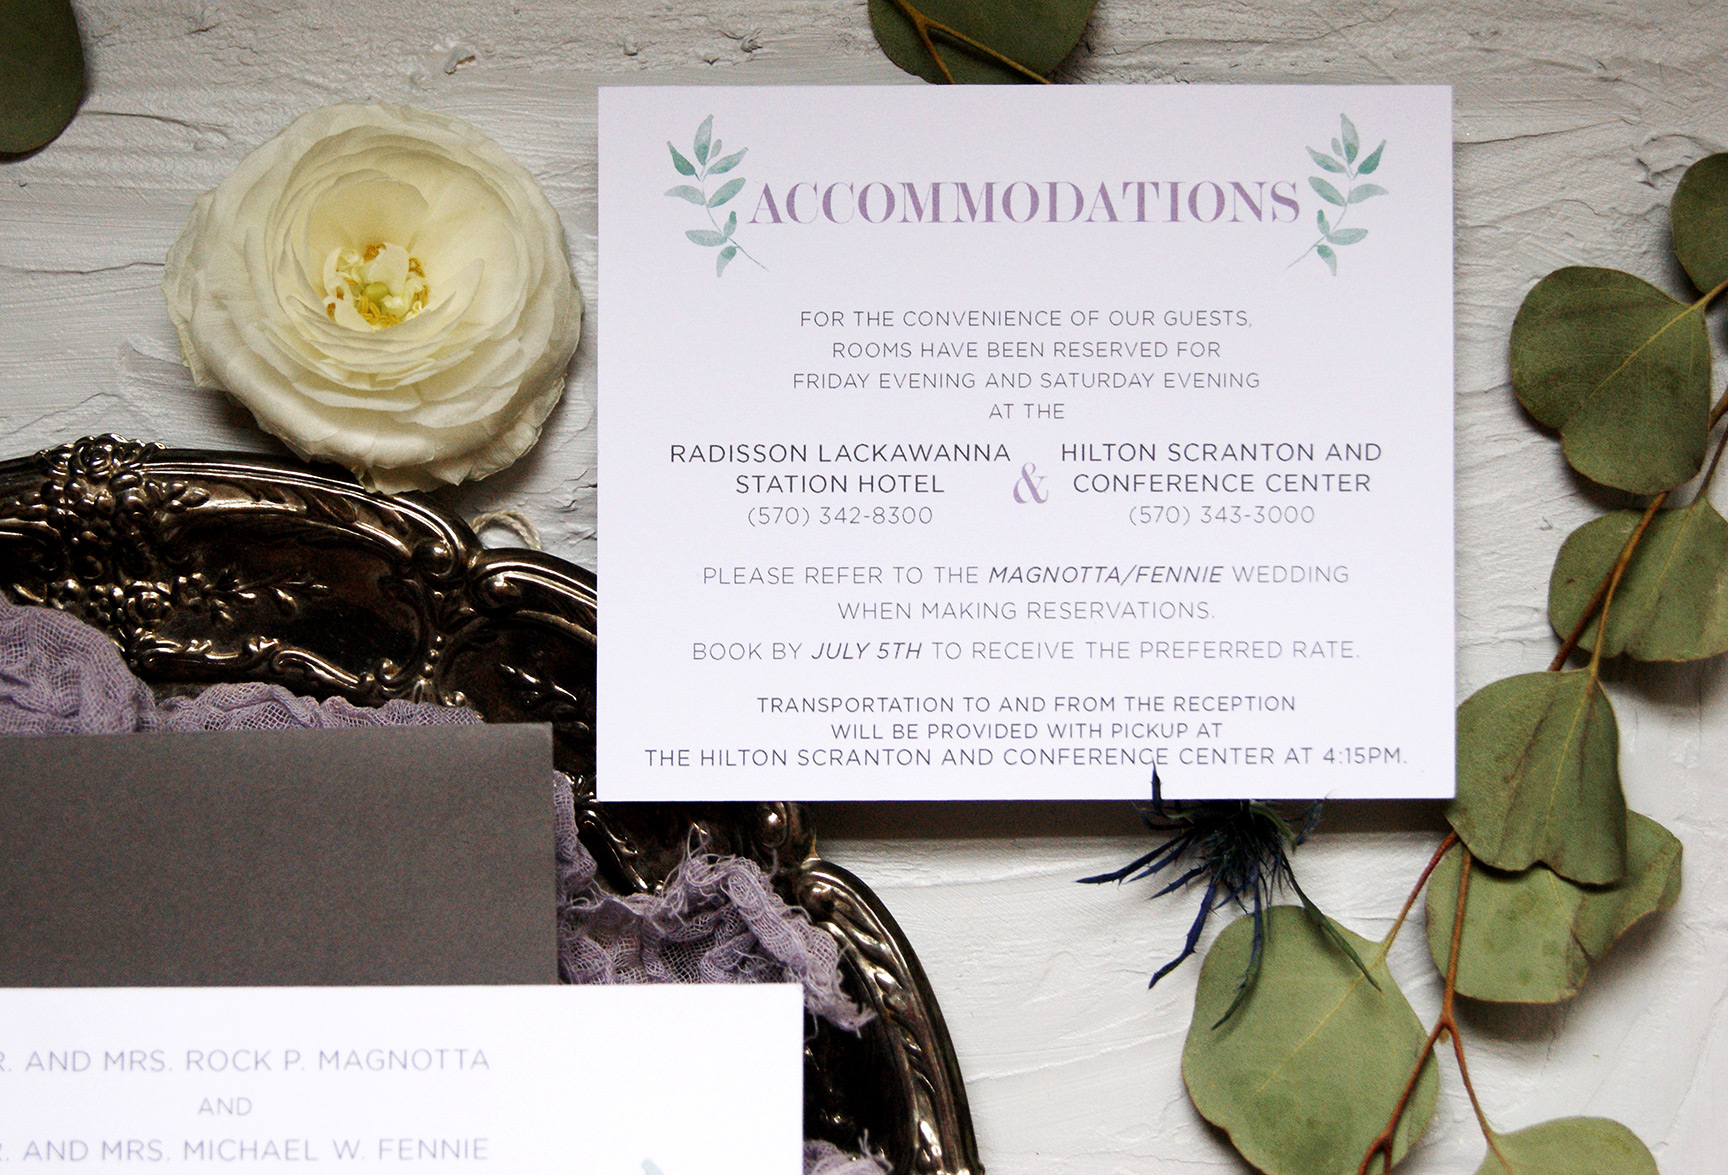 Wedding Accommodations Card | Wedding Invitation | Custom Wedding Invitations | Wedding Stationery | Wedding Invitation Suite